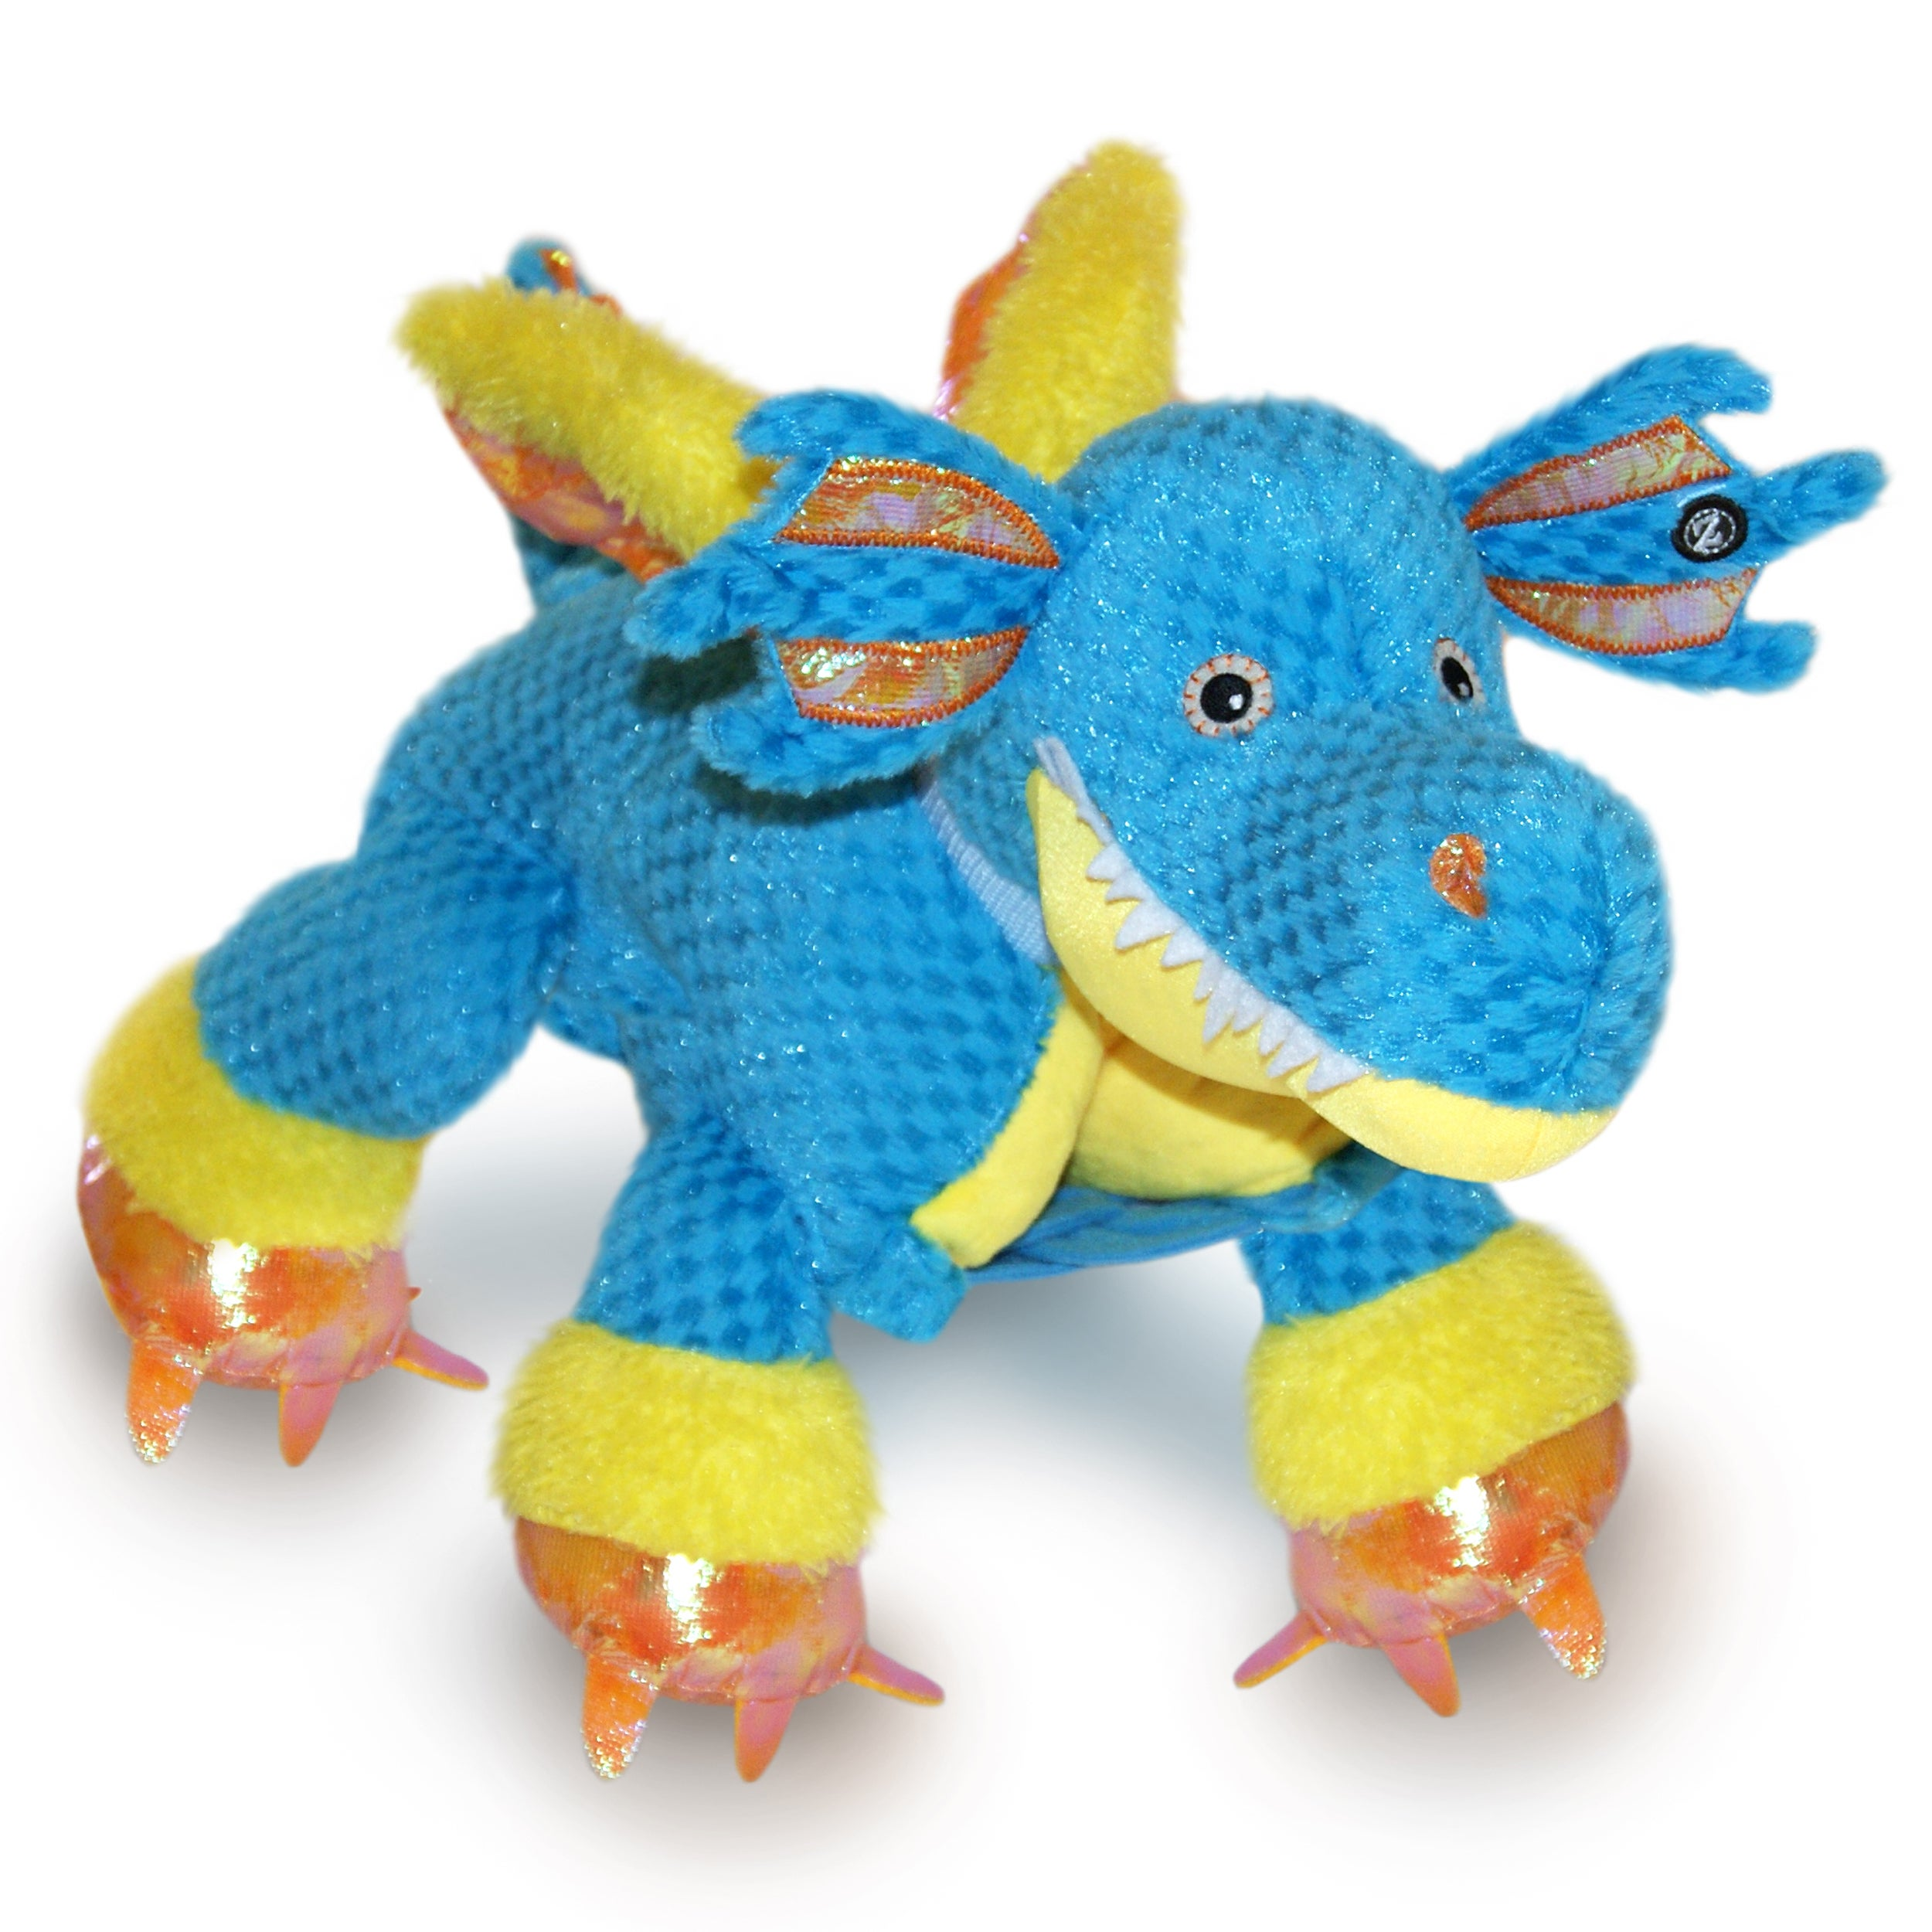 Zoobies Draco the Dragon Blanket Pet